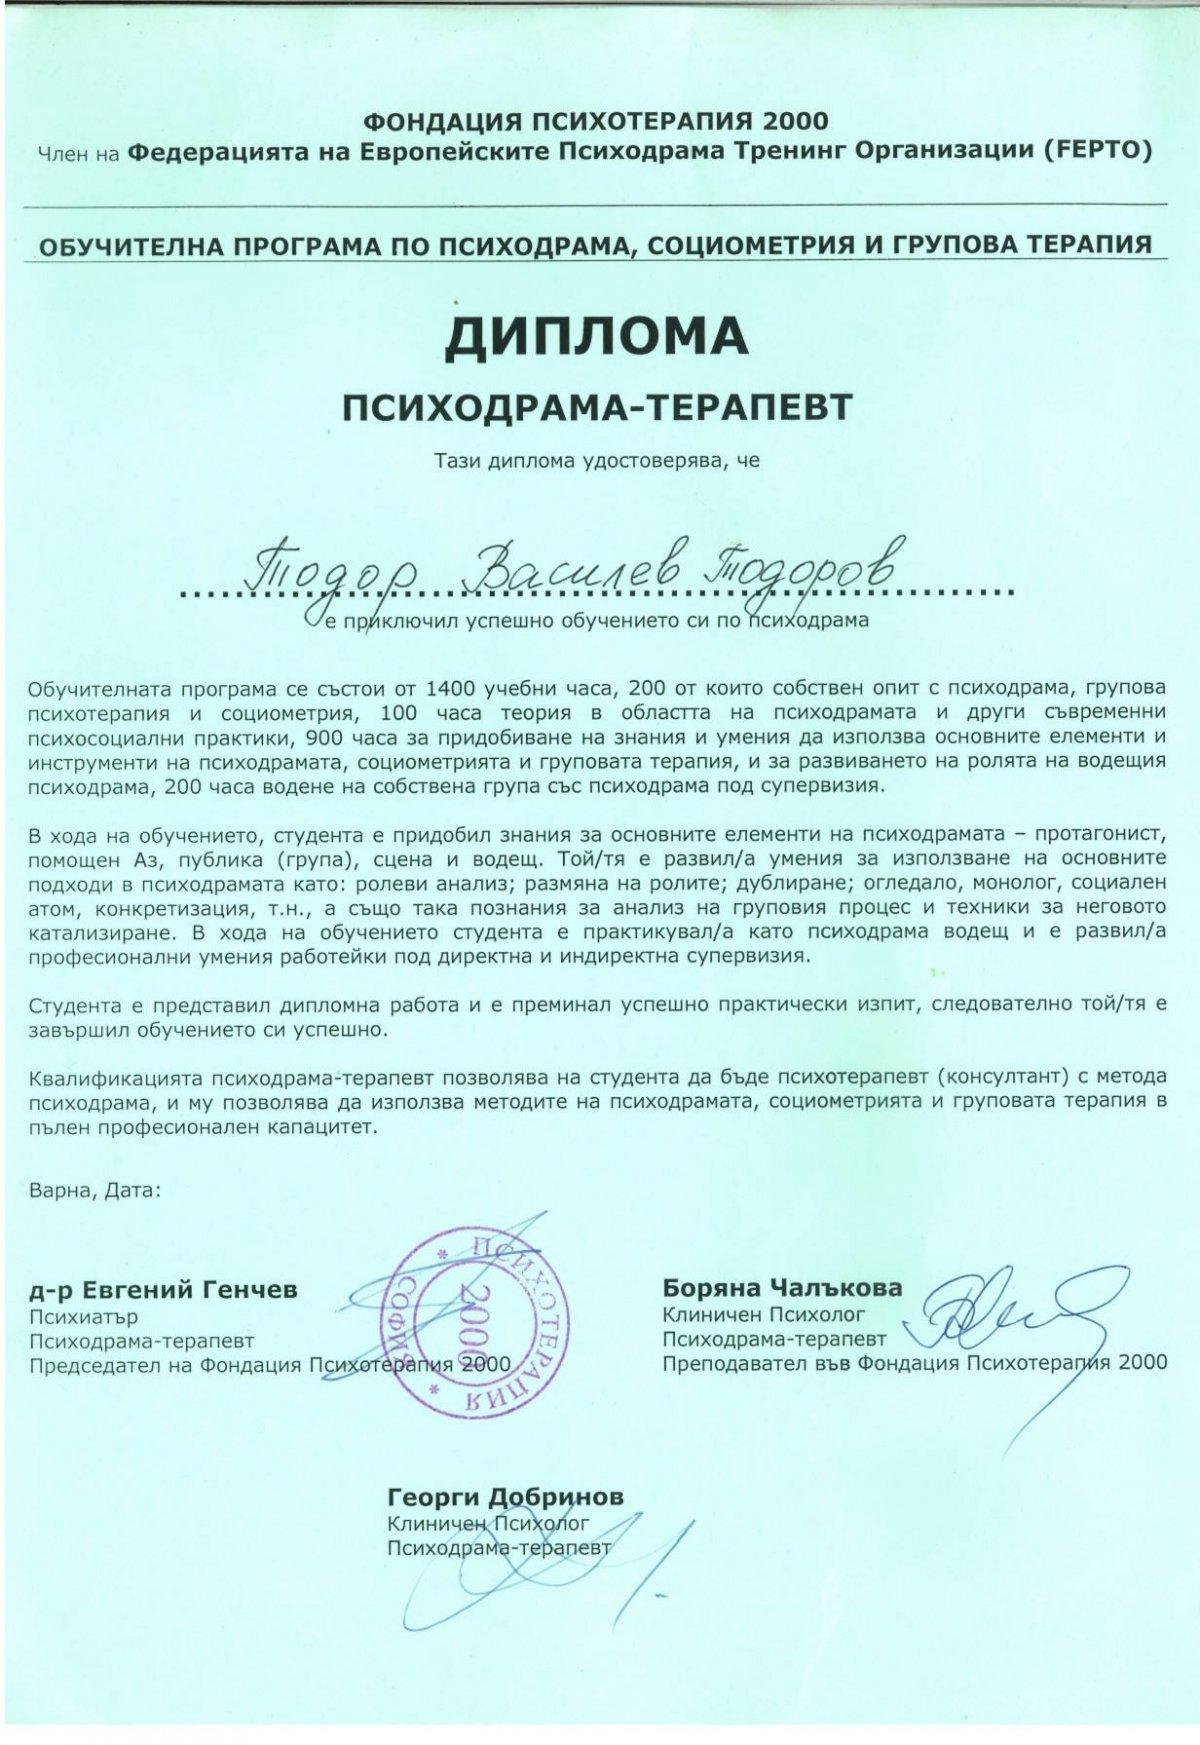 Дипломи и сертификати